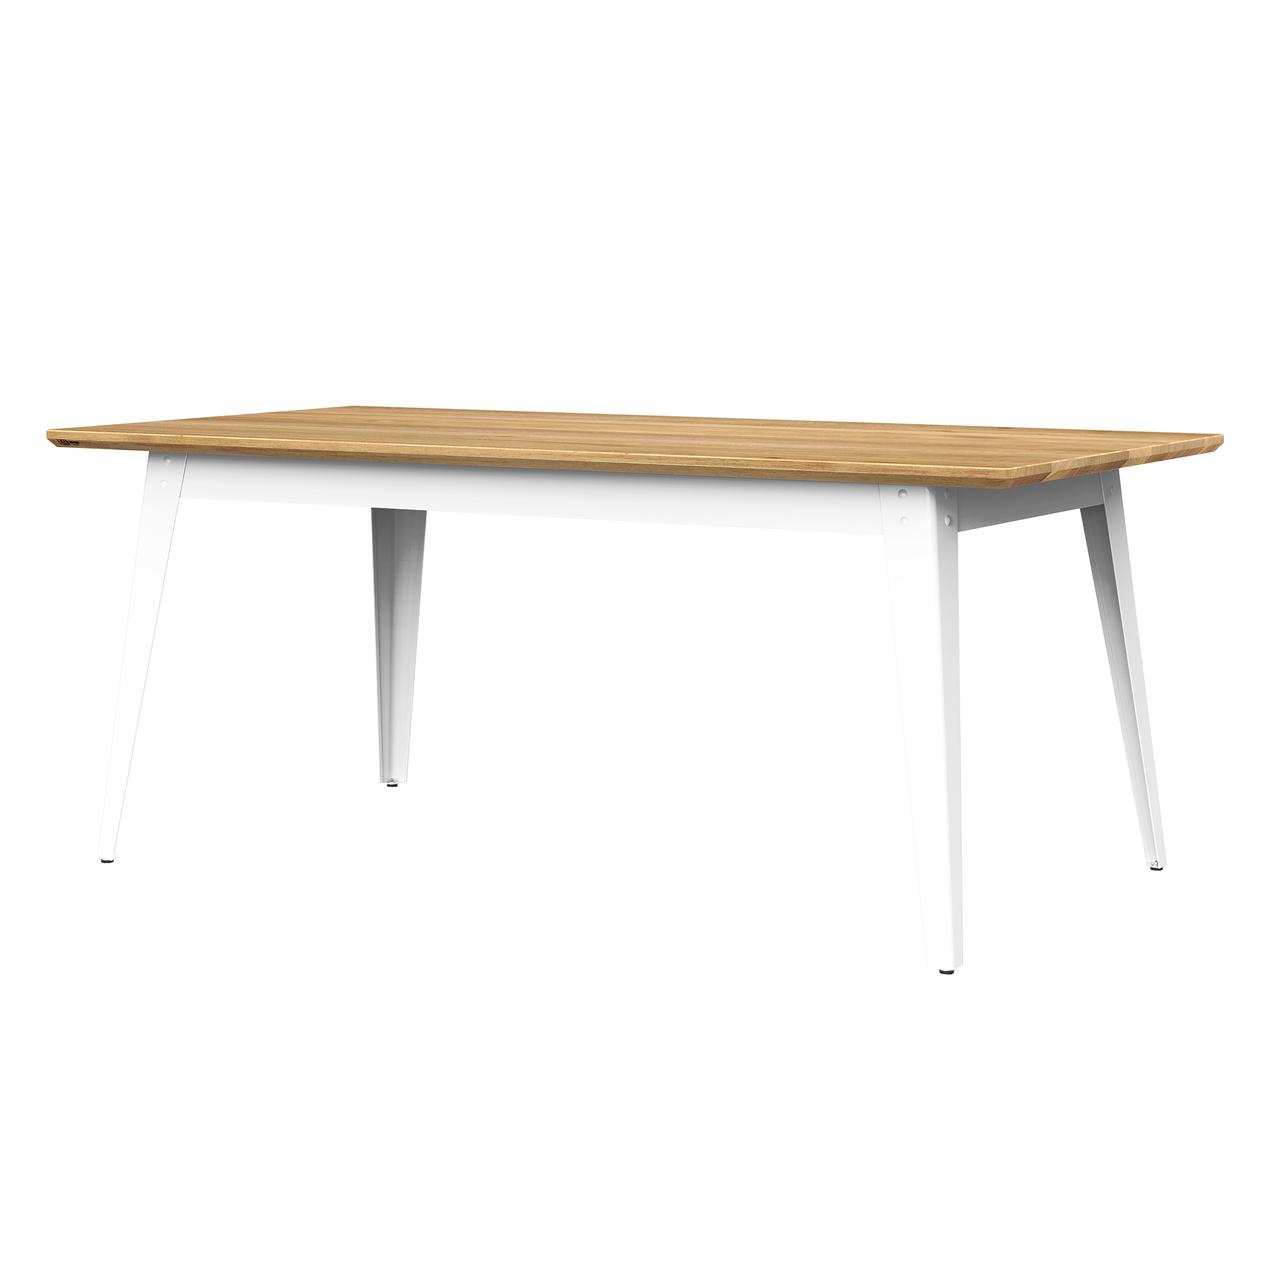 Jan Cray 6Grad Tisch Holz Weiss, Eichenholz geölt, B: 70 cm / L: 120 cm